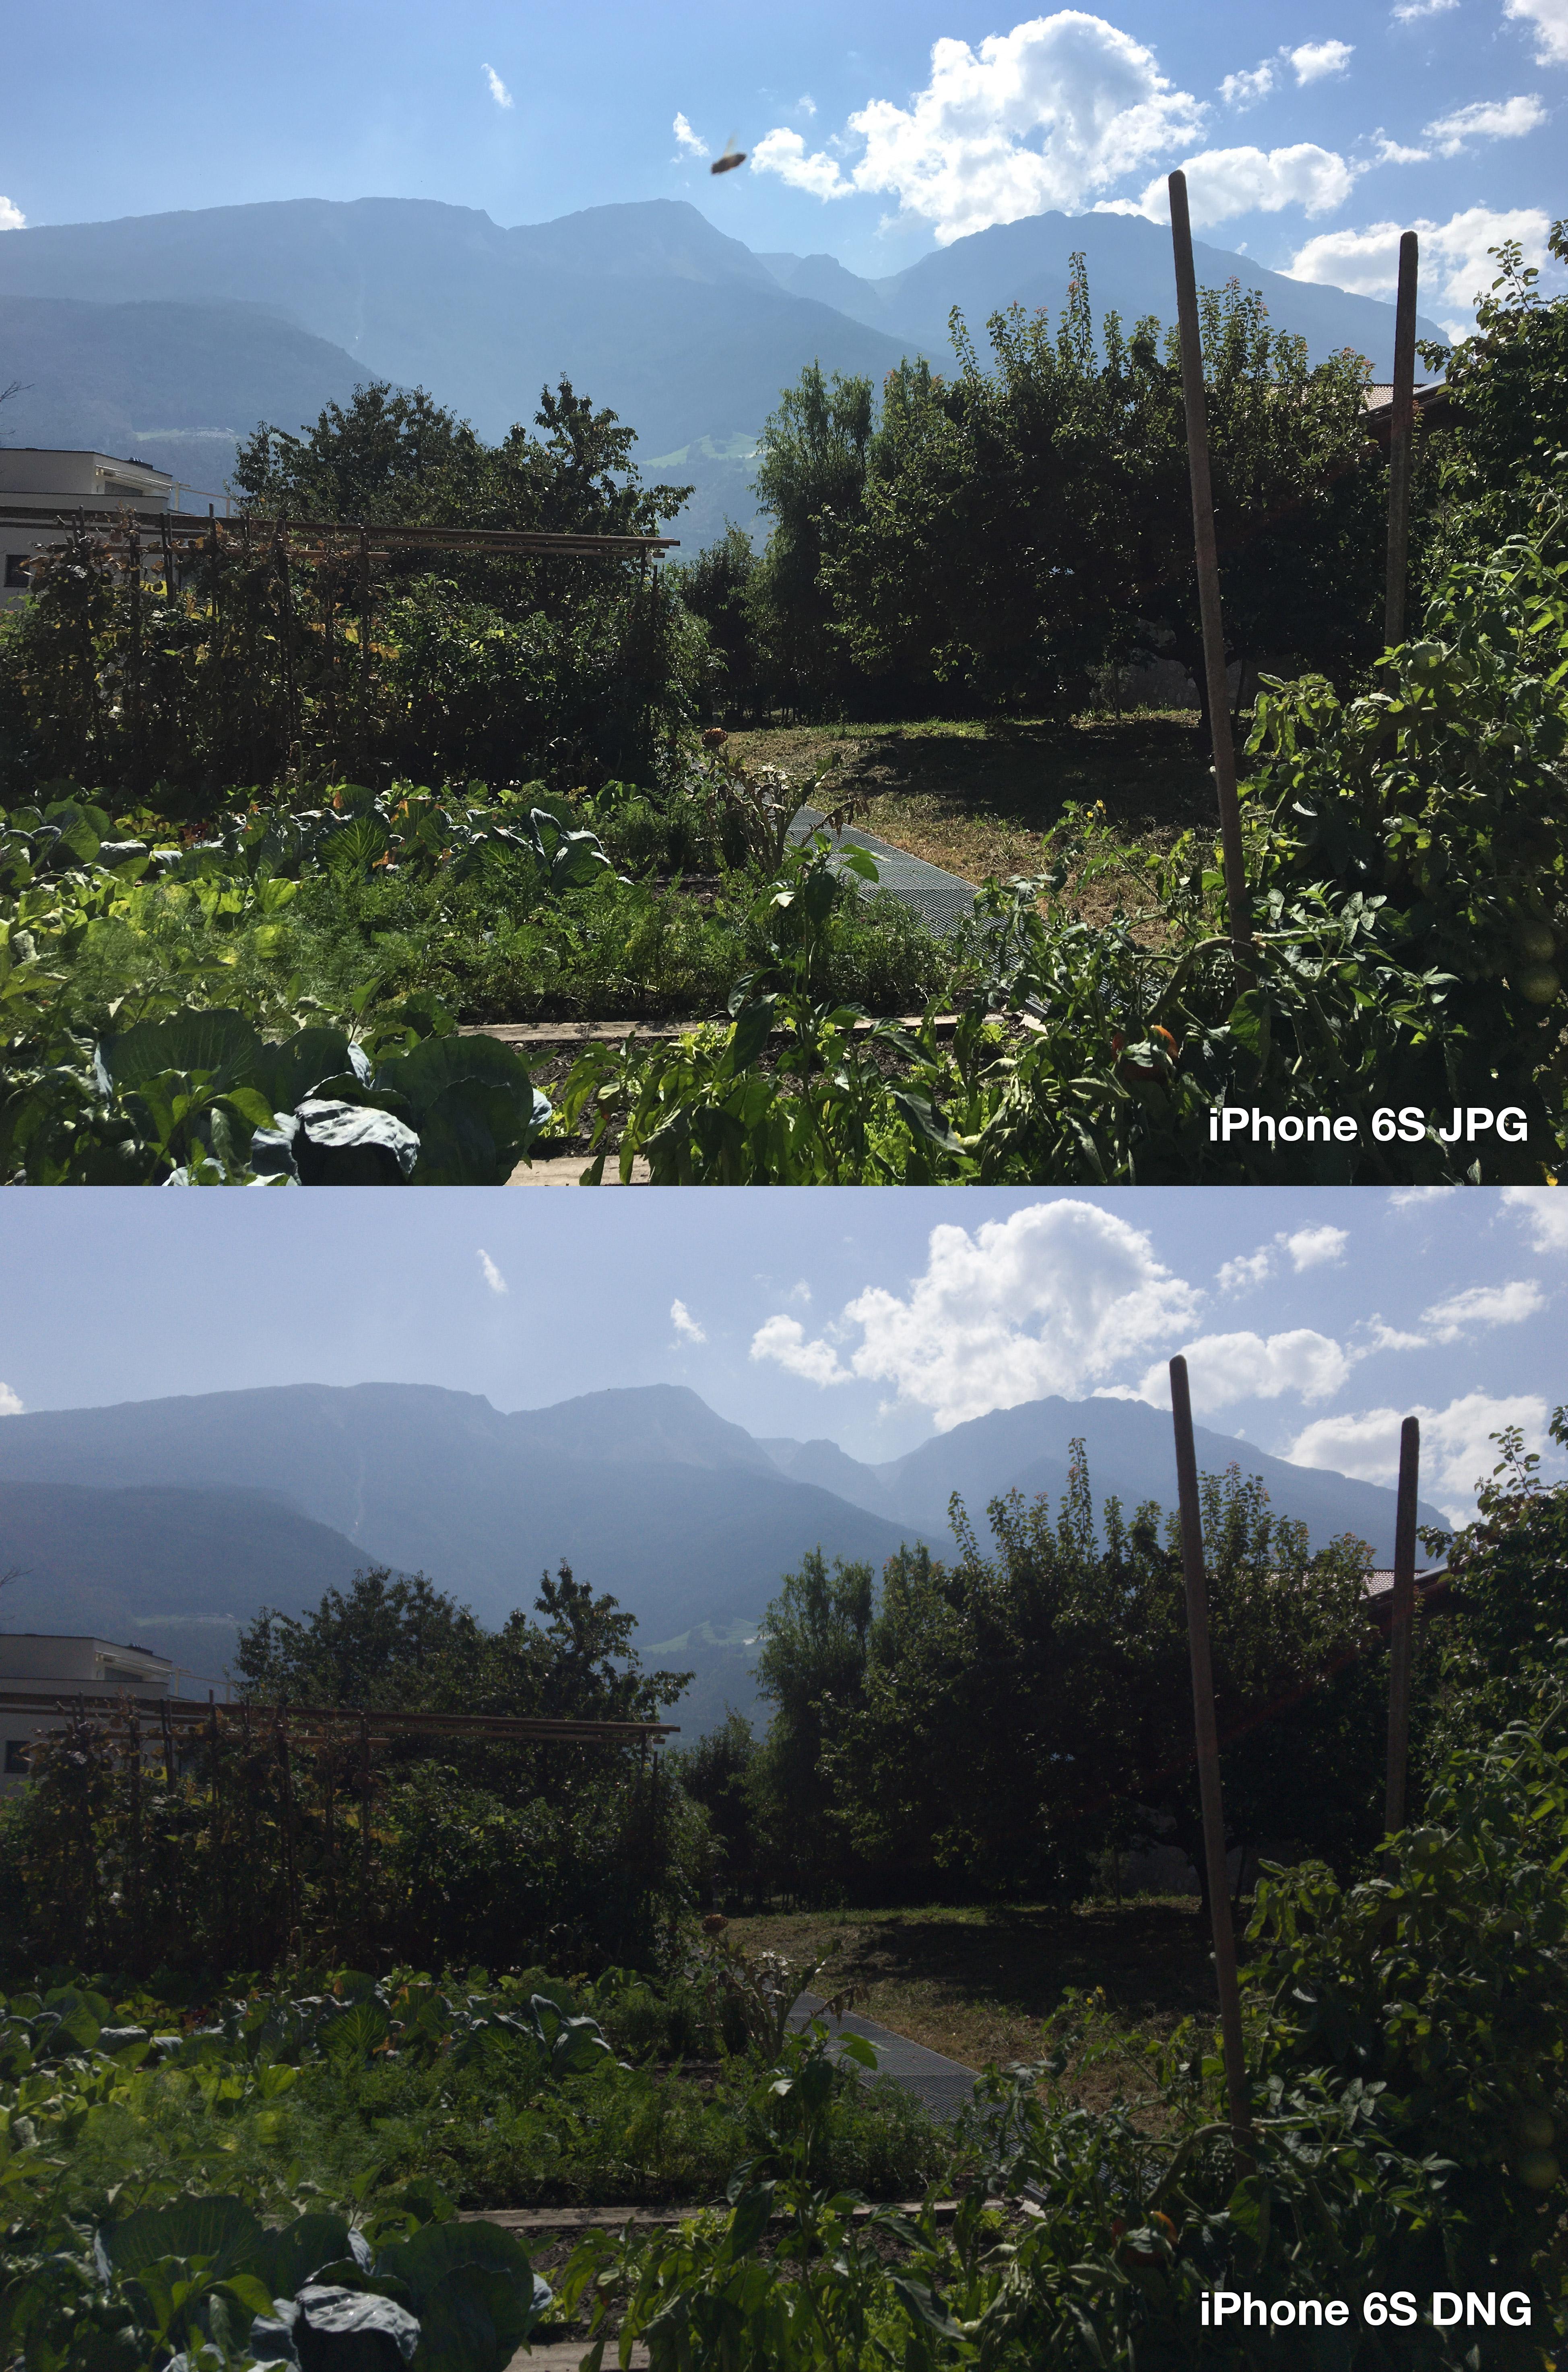 iphone-6s-lightroom-jpg-vs-dng-4